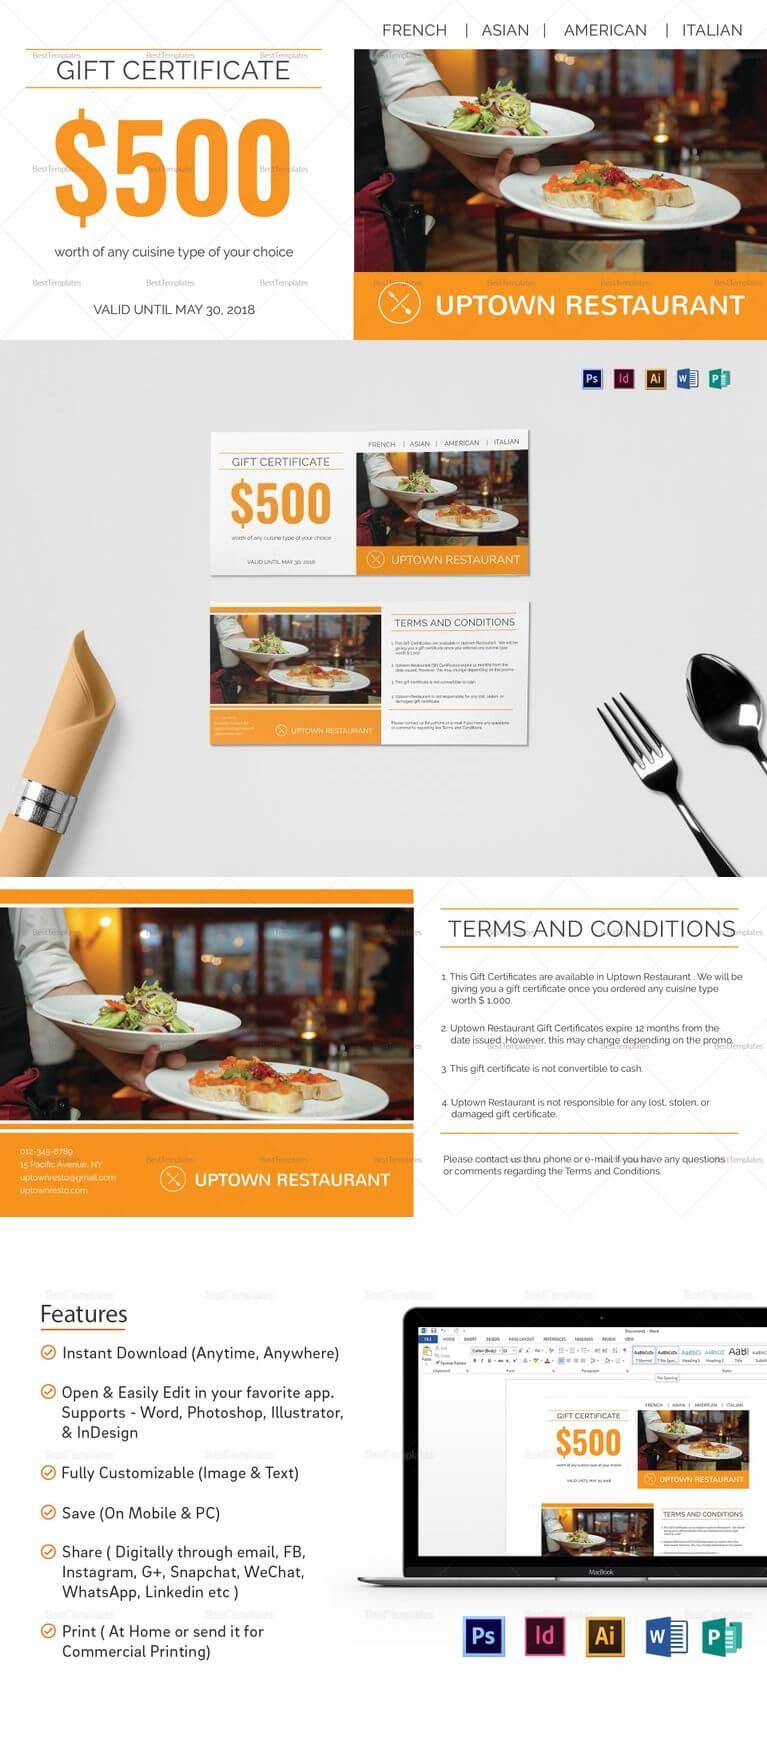 Restaurant Gift Certificate Template | ❱❱ Restaurant Intended For Restaurant Gift Certificate Template